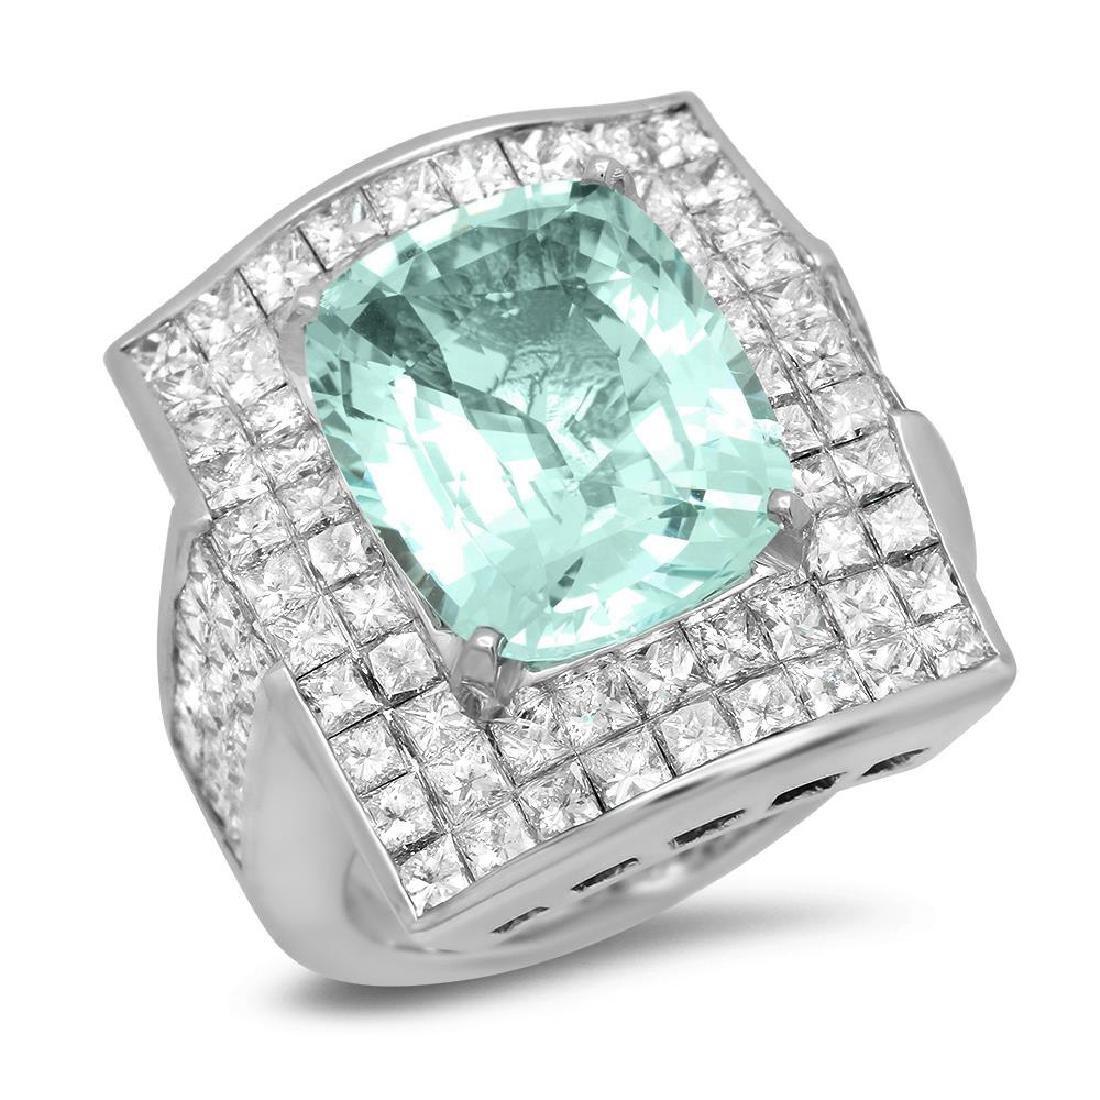 14K Gold 7.79ct Aquamarine 7.02cts Diamond Ring